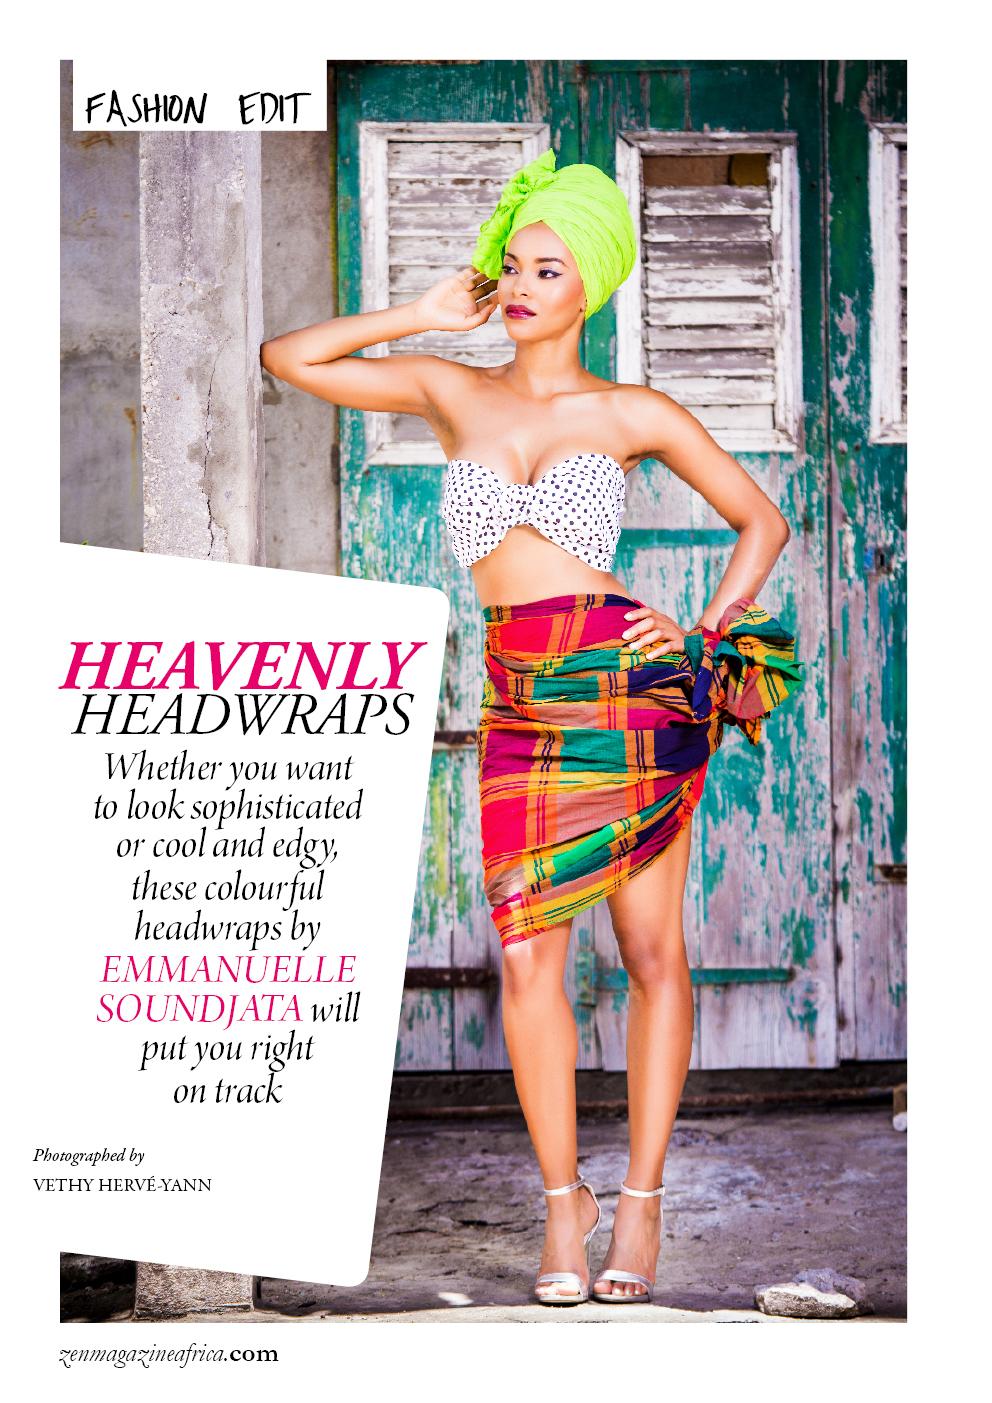 EmmanuelSoundajaheadwrapsAfricanZenMagazineAfrica01